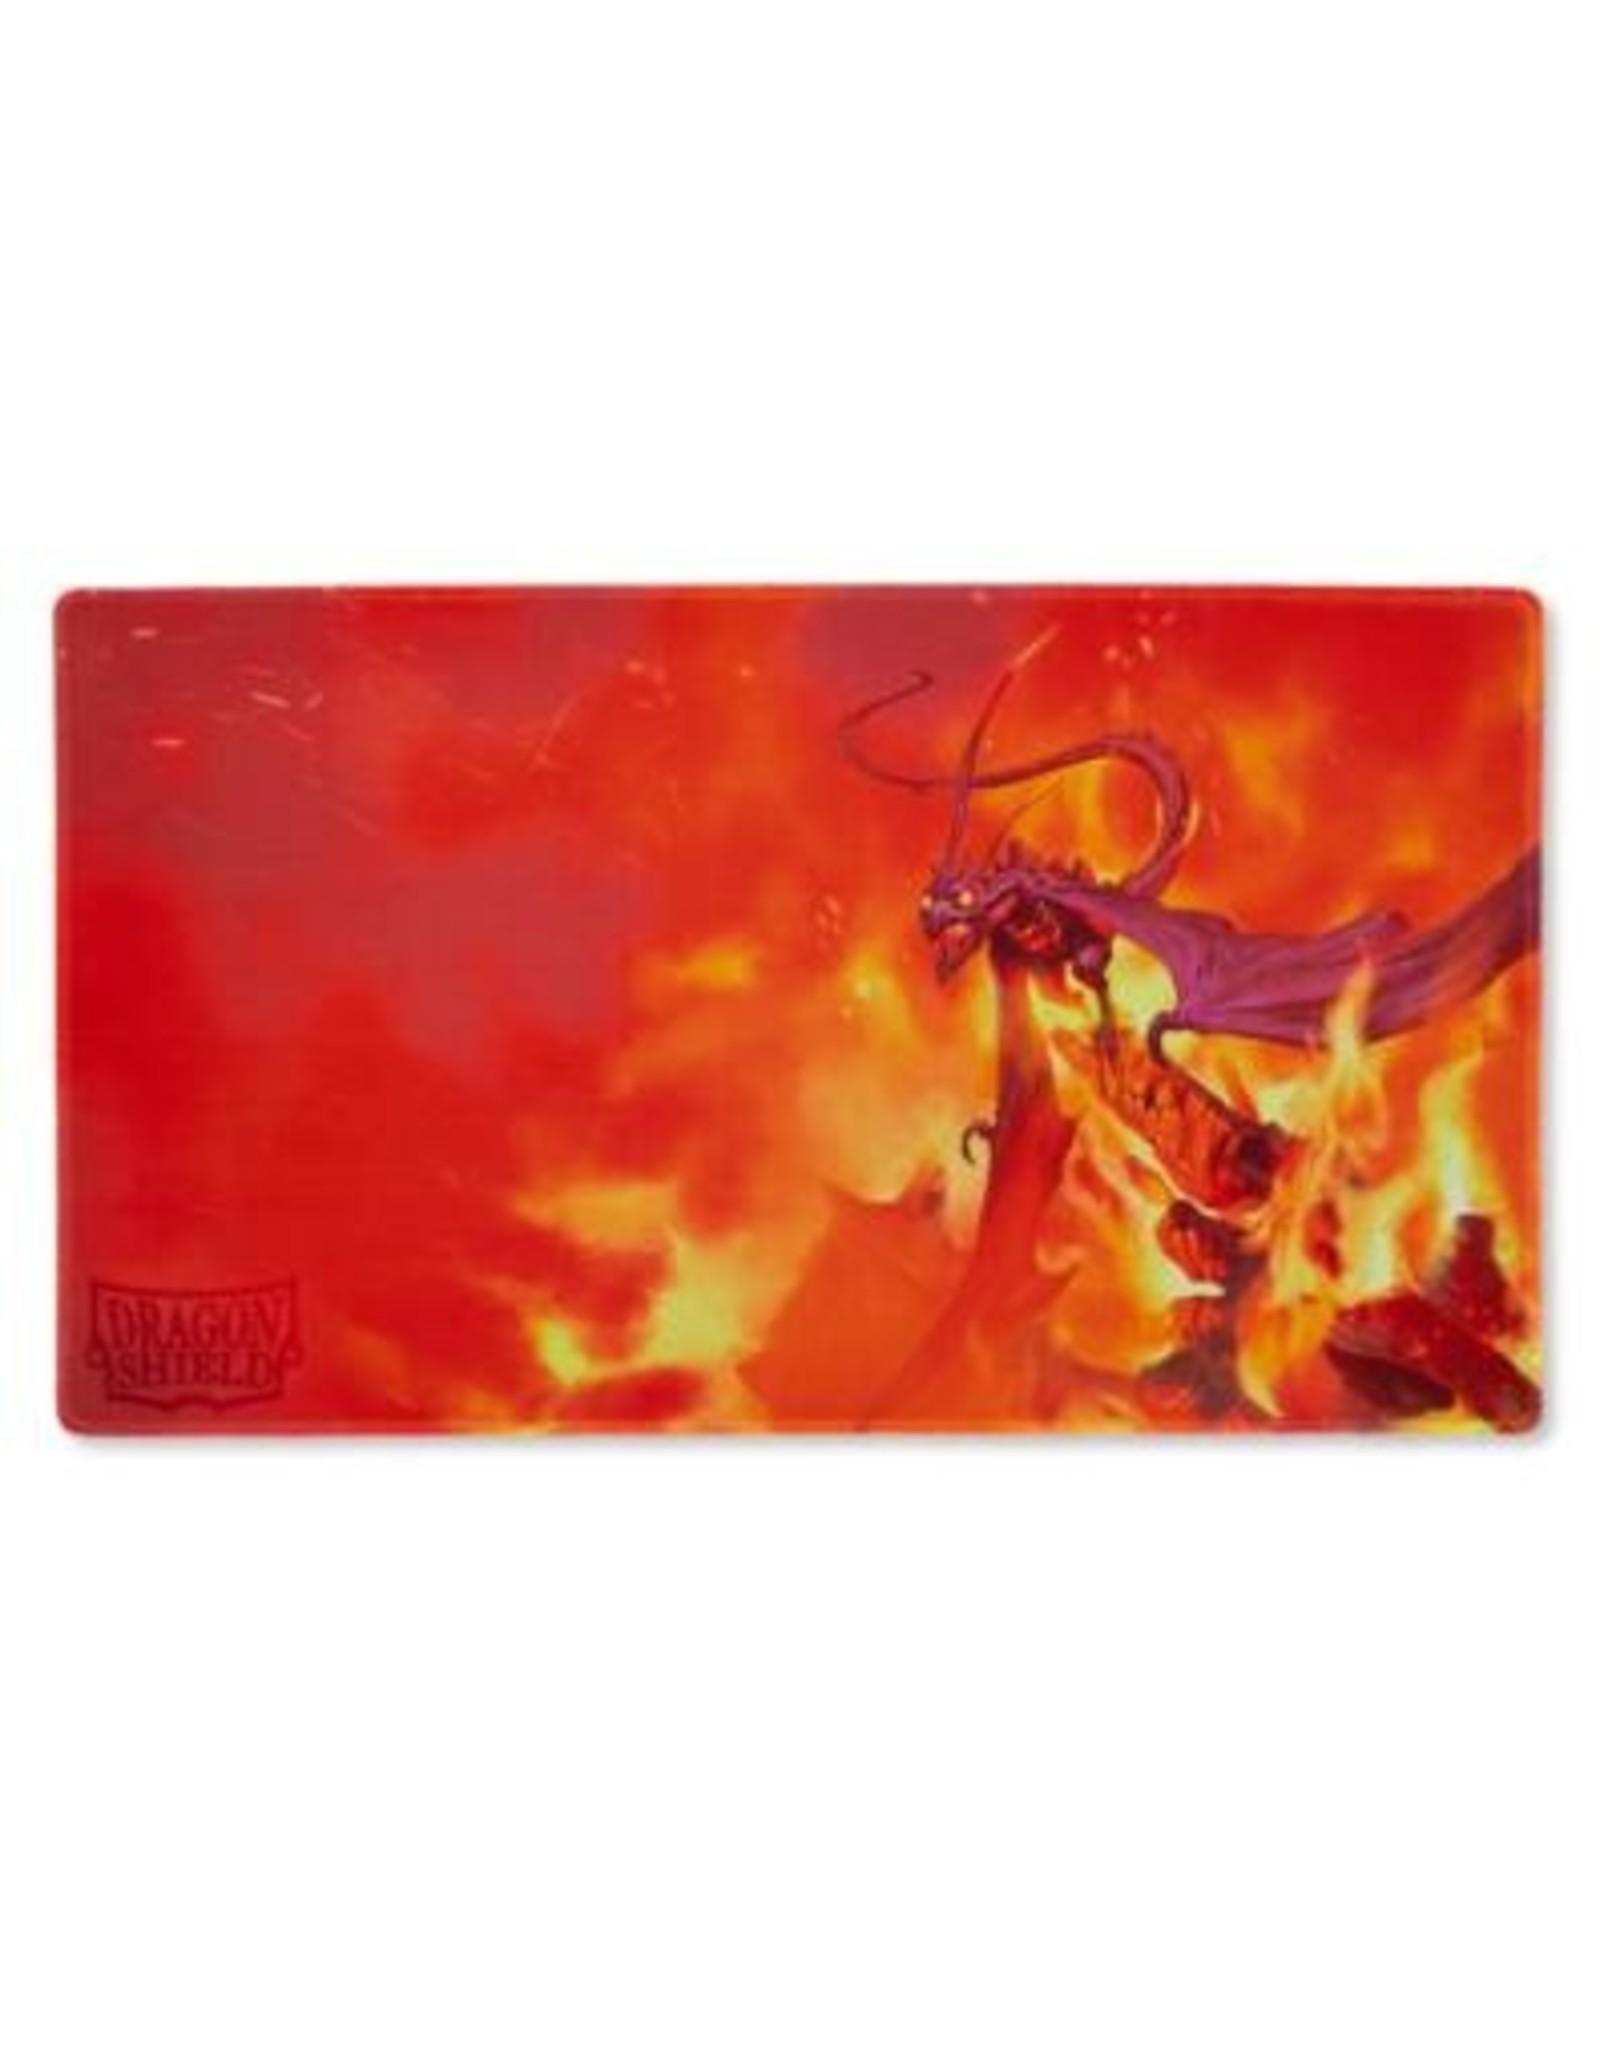 Arcane Tinmen 'Usaqin' the one Who Knocks Limited Edition Playmat